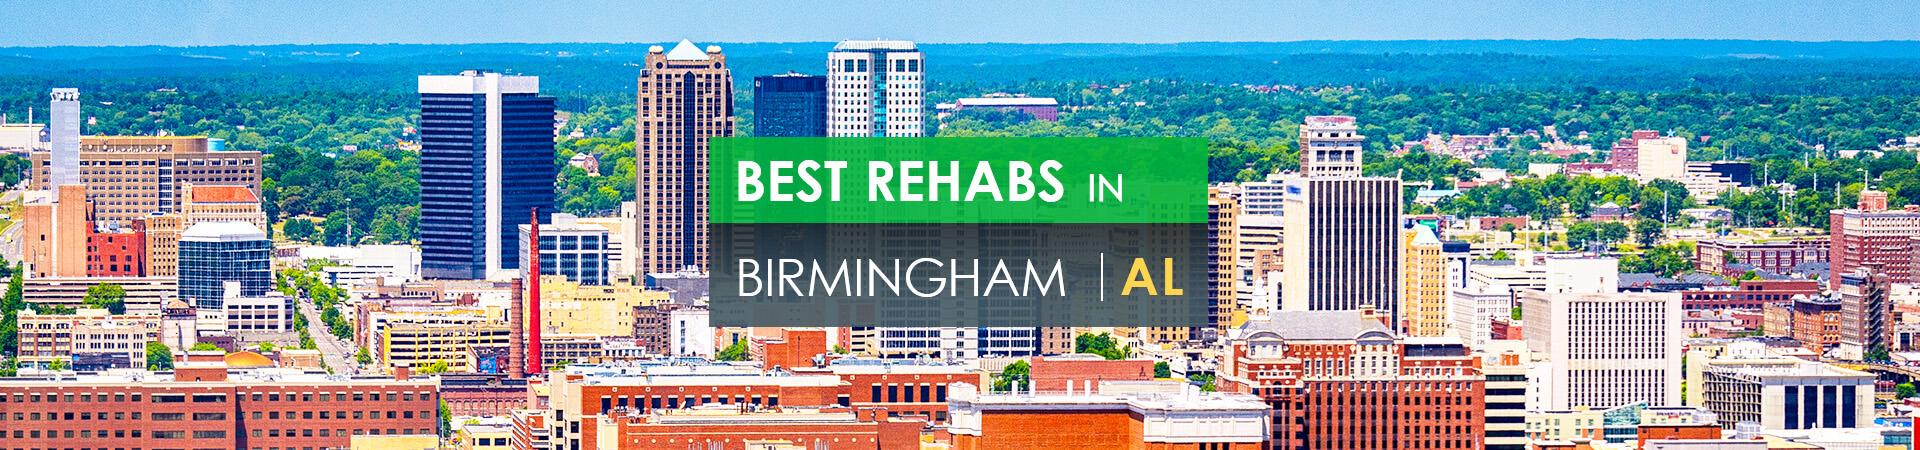 Best rehabs in Birmingham, AL